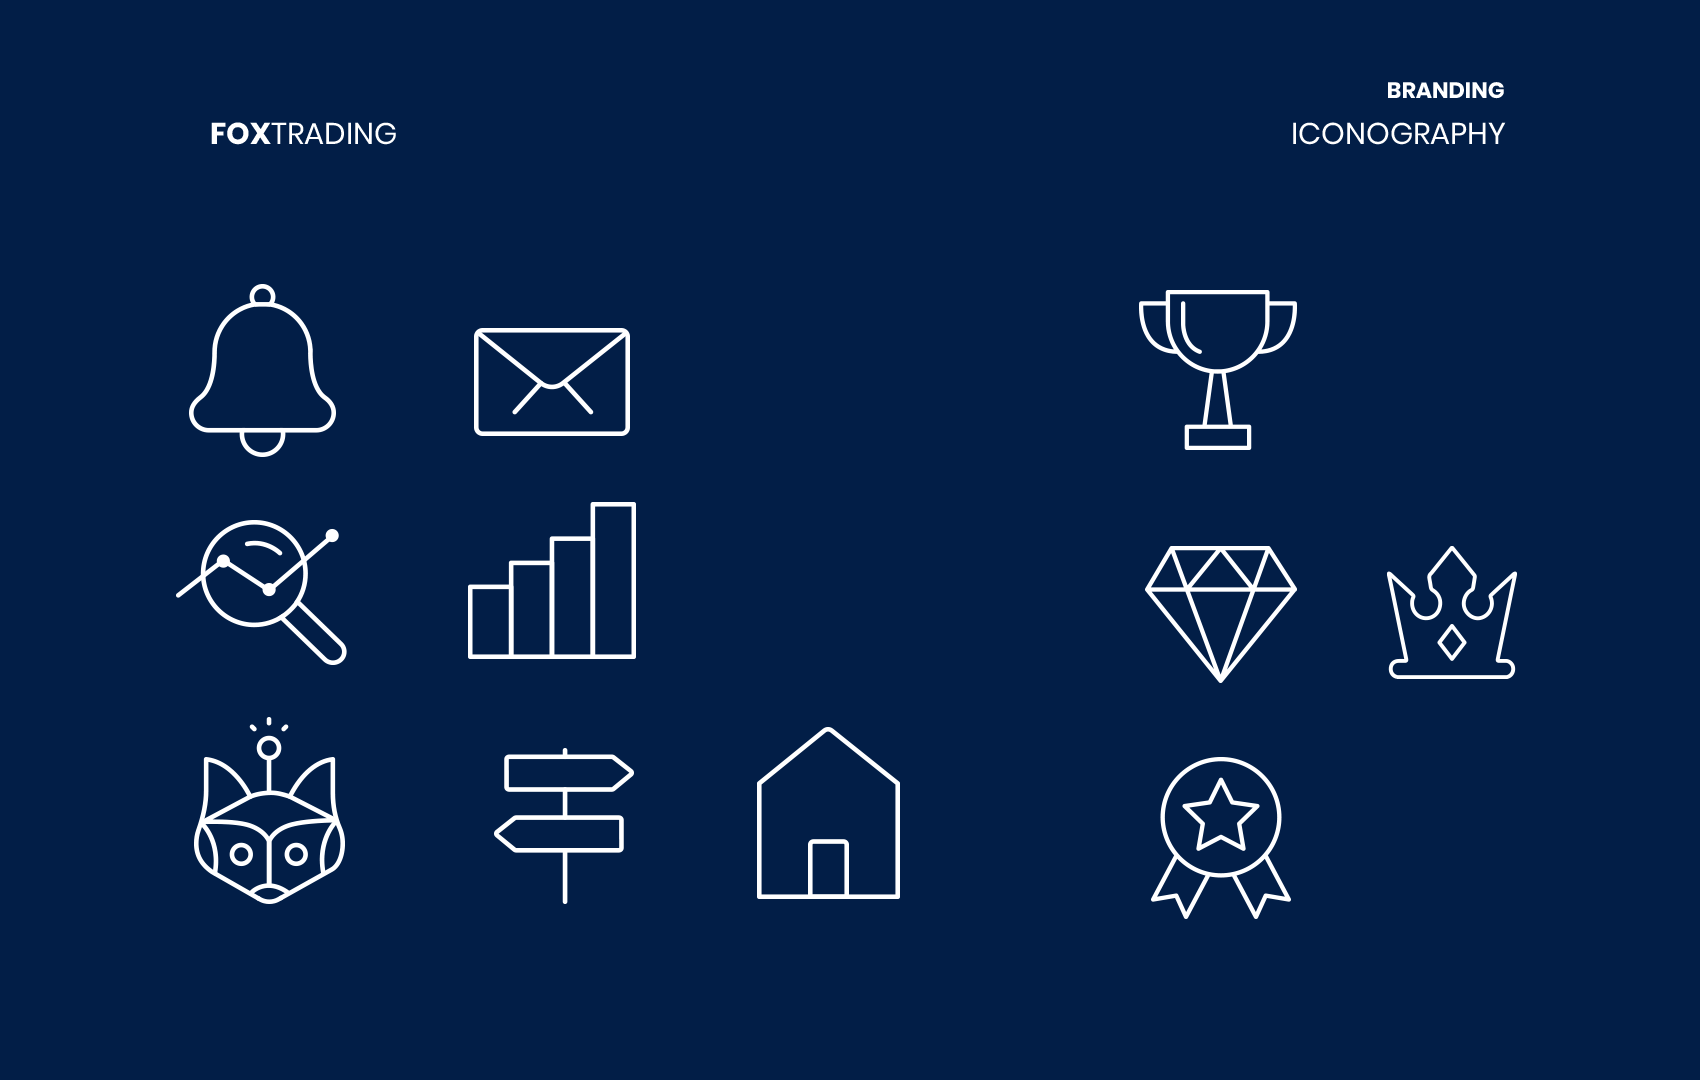 disculpi-fox-trading-rebranding-crypto-vilafranca-penedes-disseny-grafic-web-icons